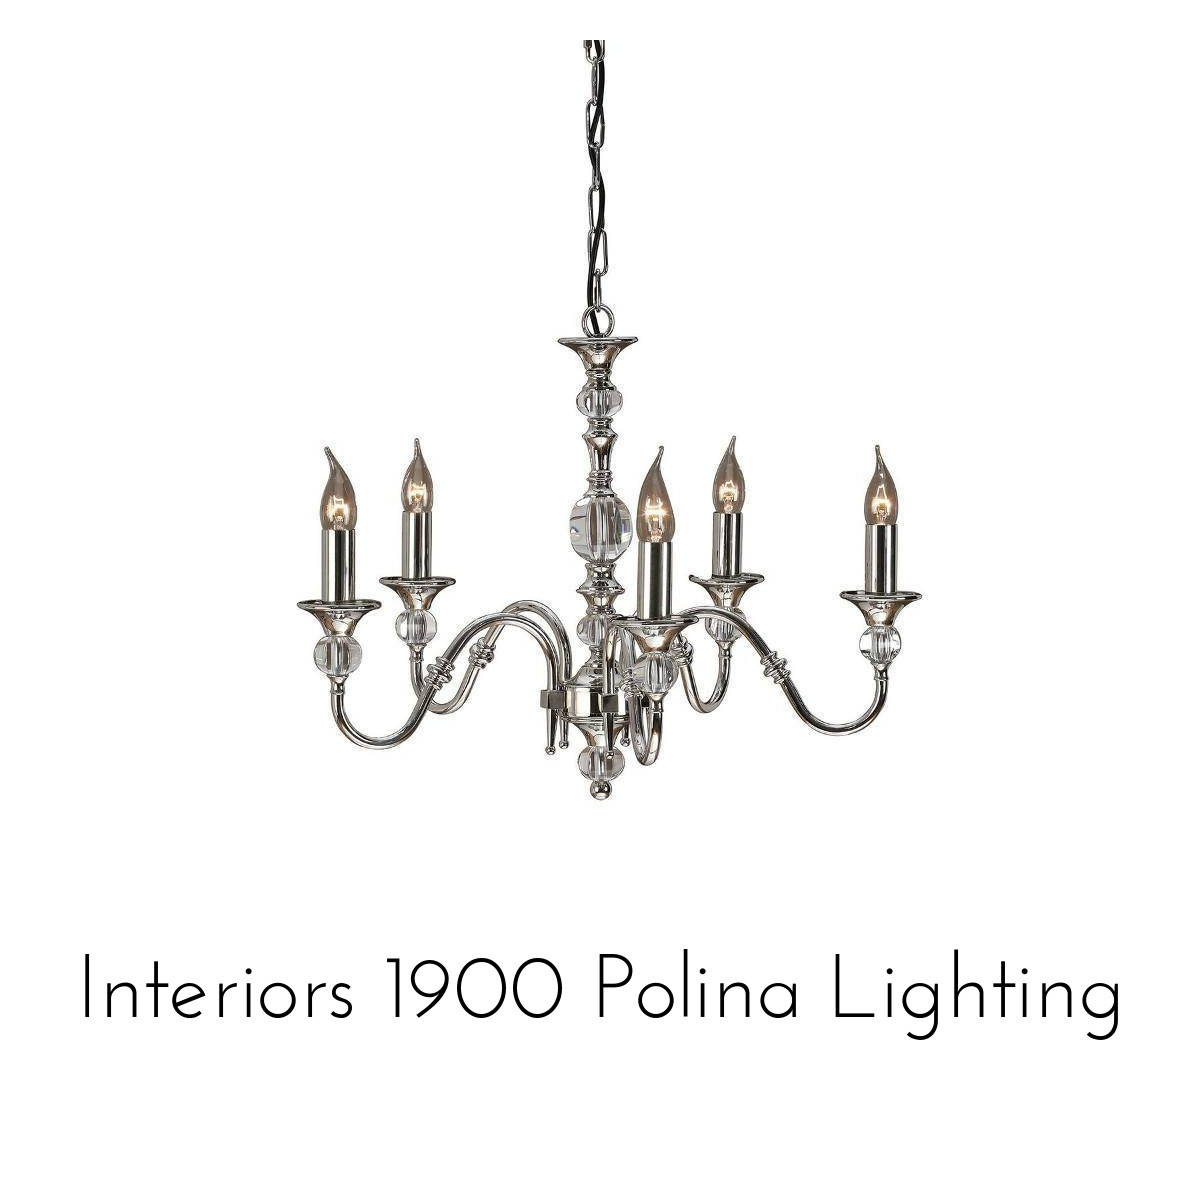 interiors 1900 polina lighting collection